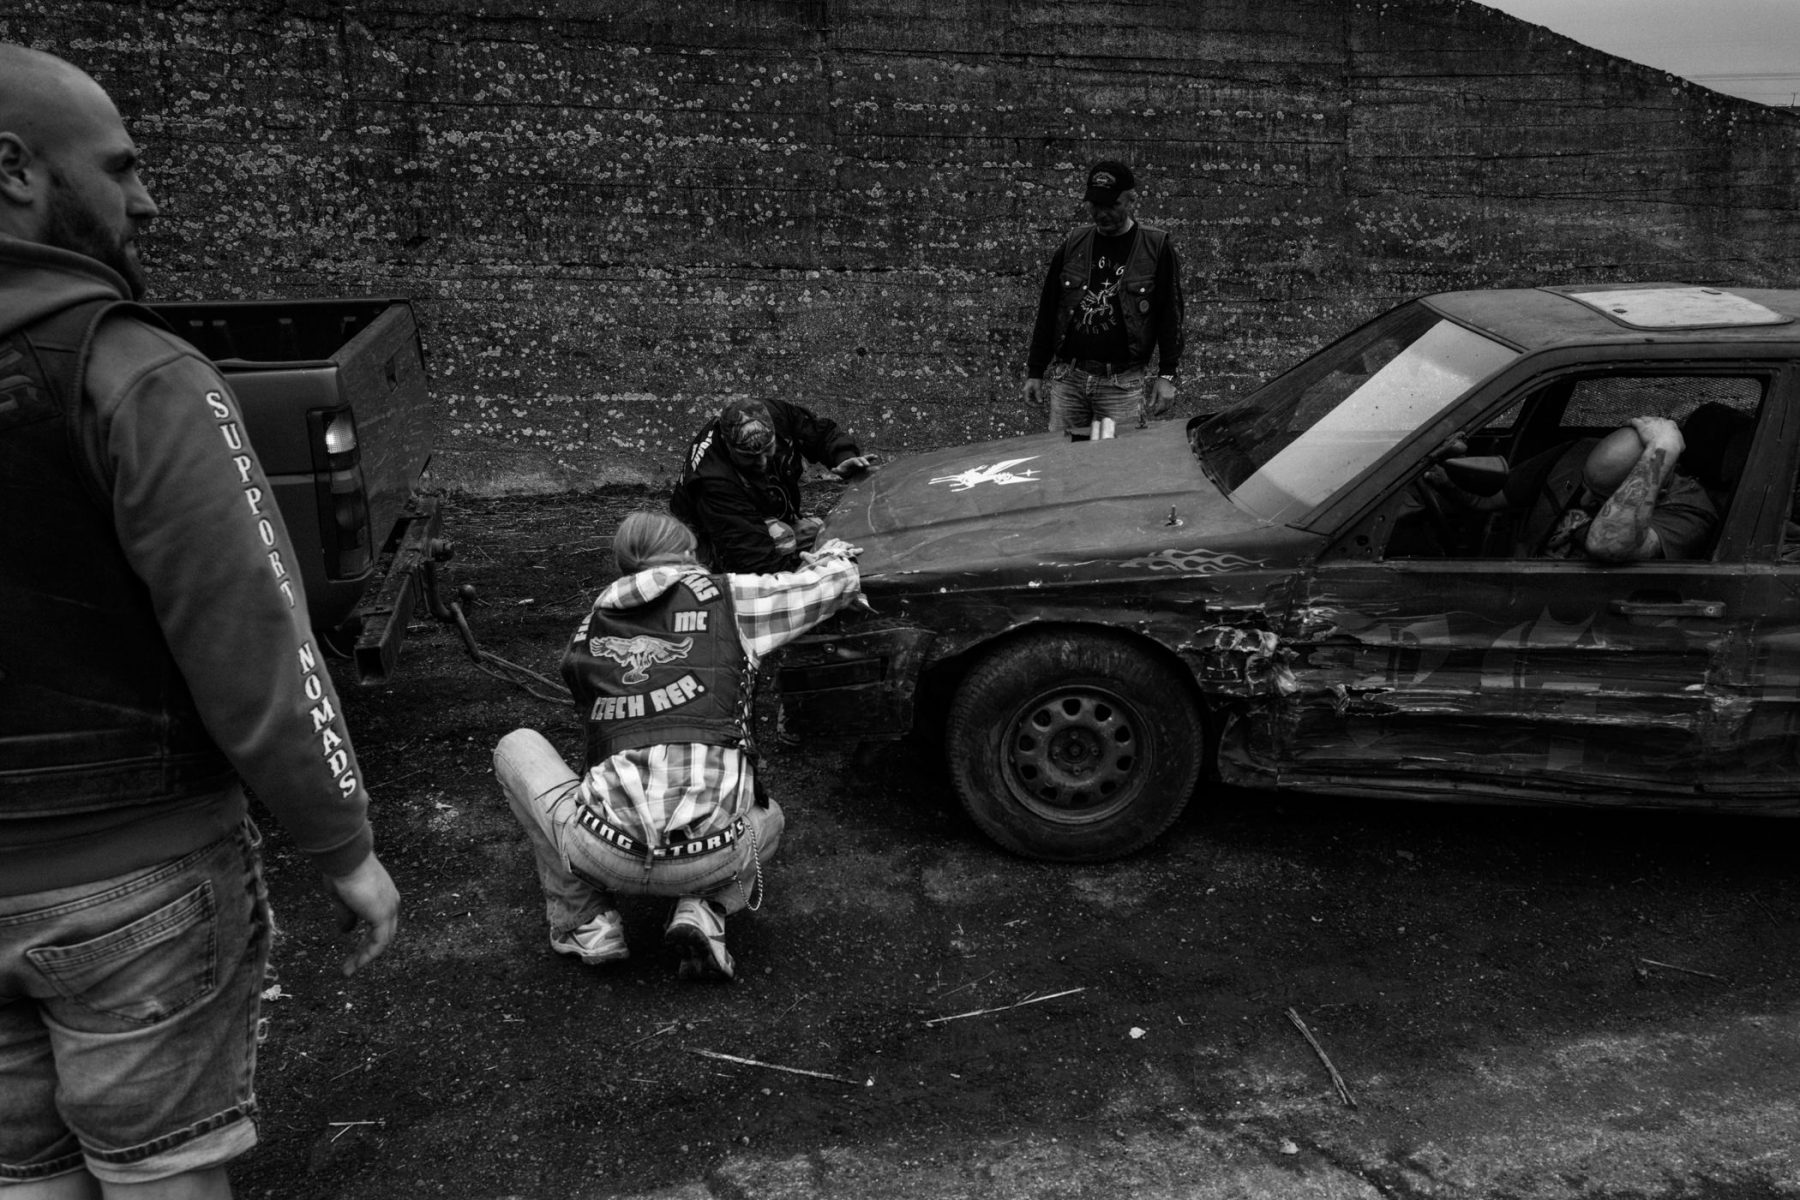 kevin_v_ton_Crash-Cars_12